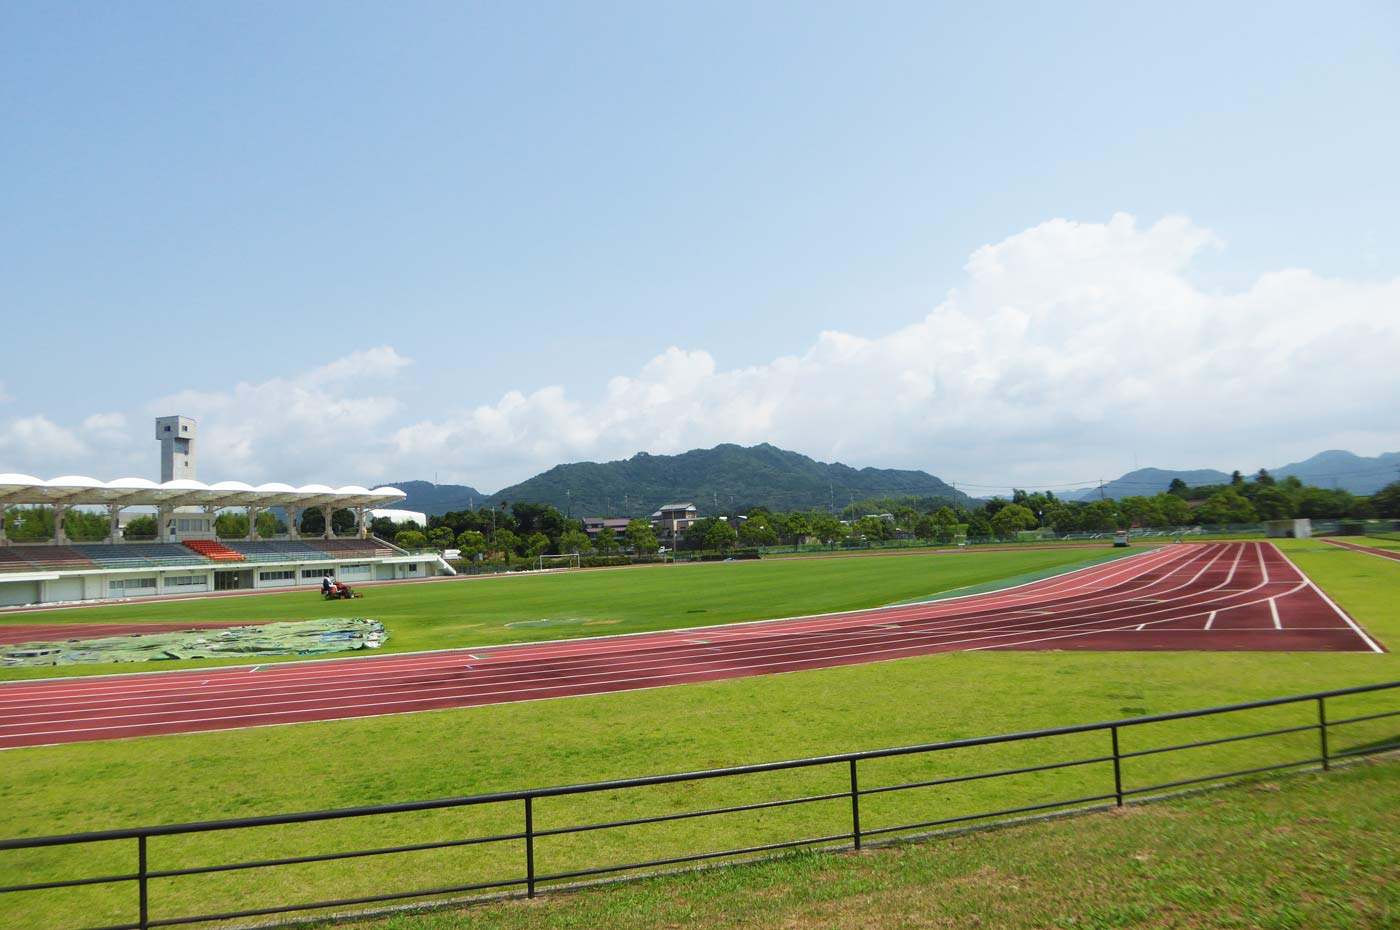 鴨川総合運動施設のの陸上競技場